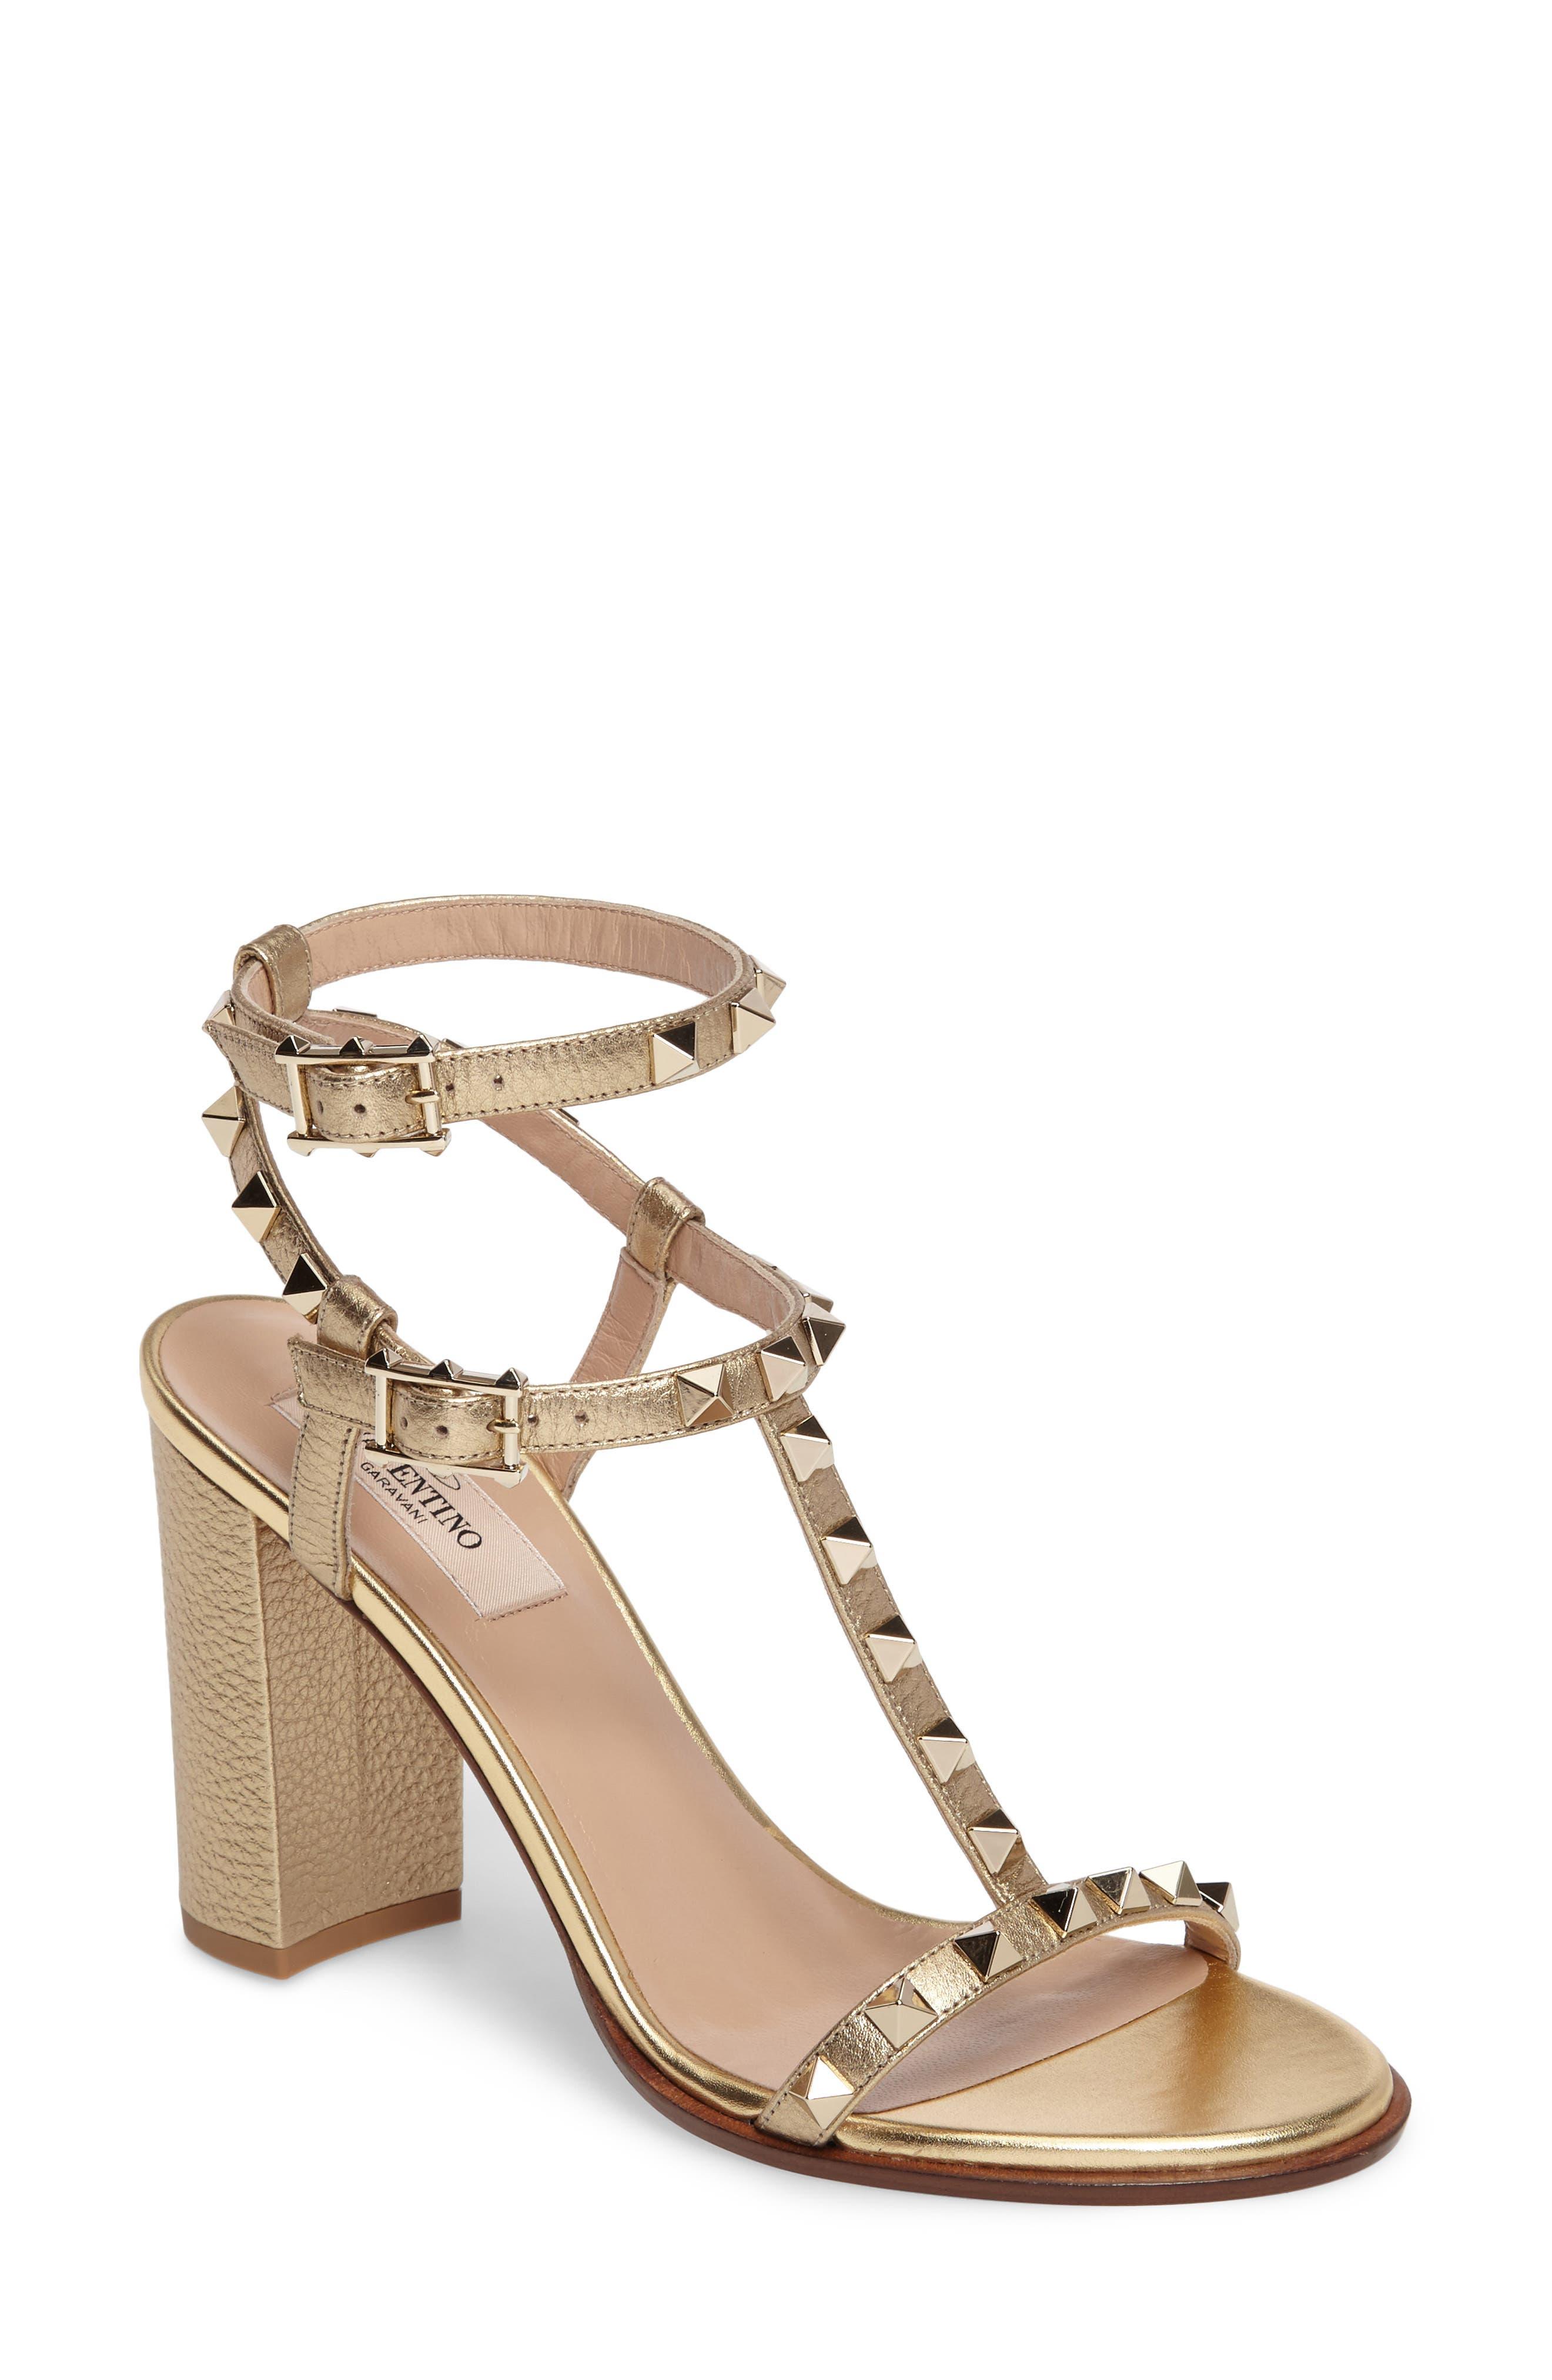 Main Image - VALENTINO GARAVANI Rockstud Ankle Strap Sandal (Women)